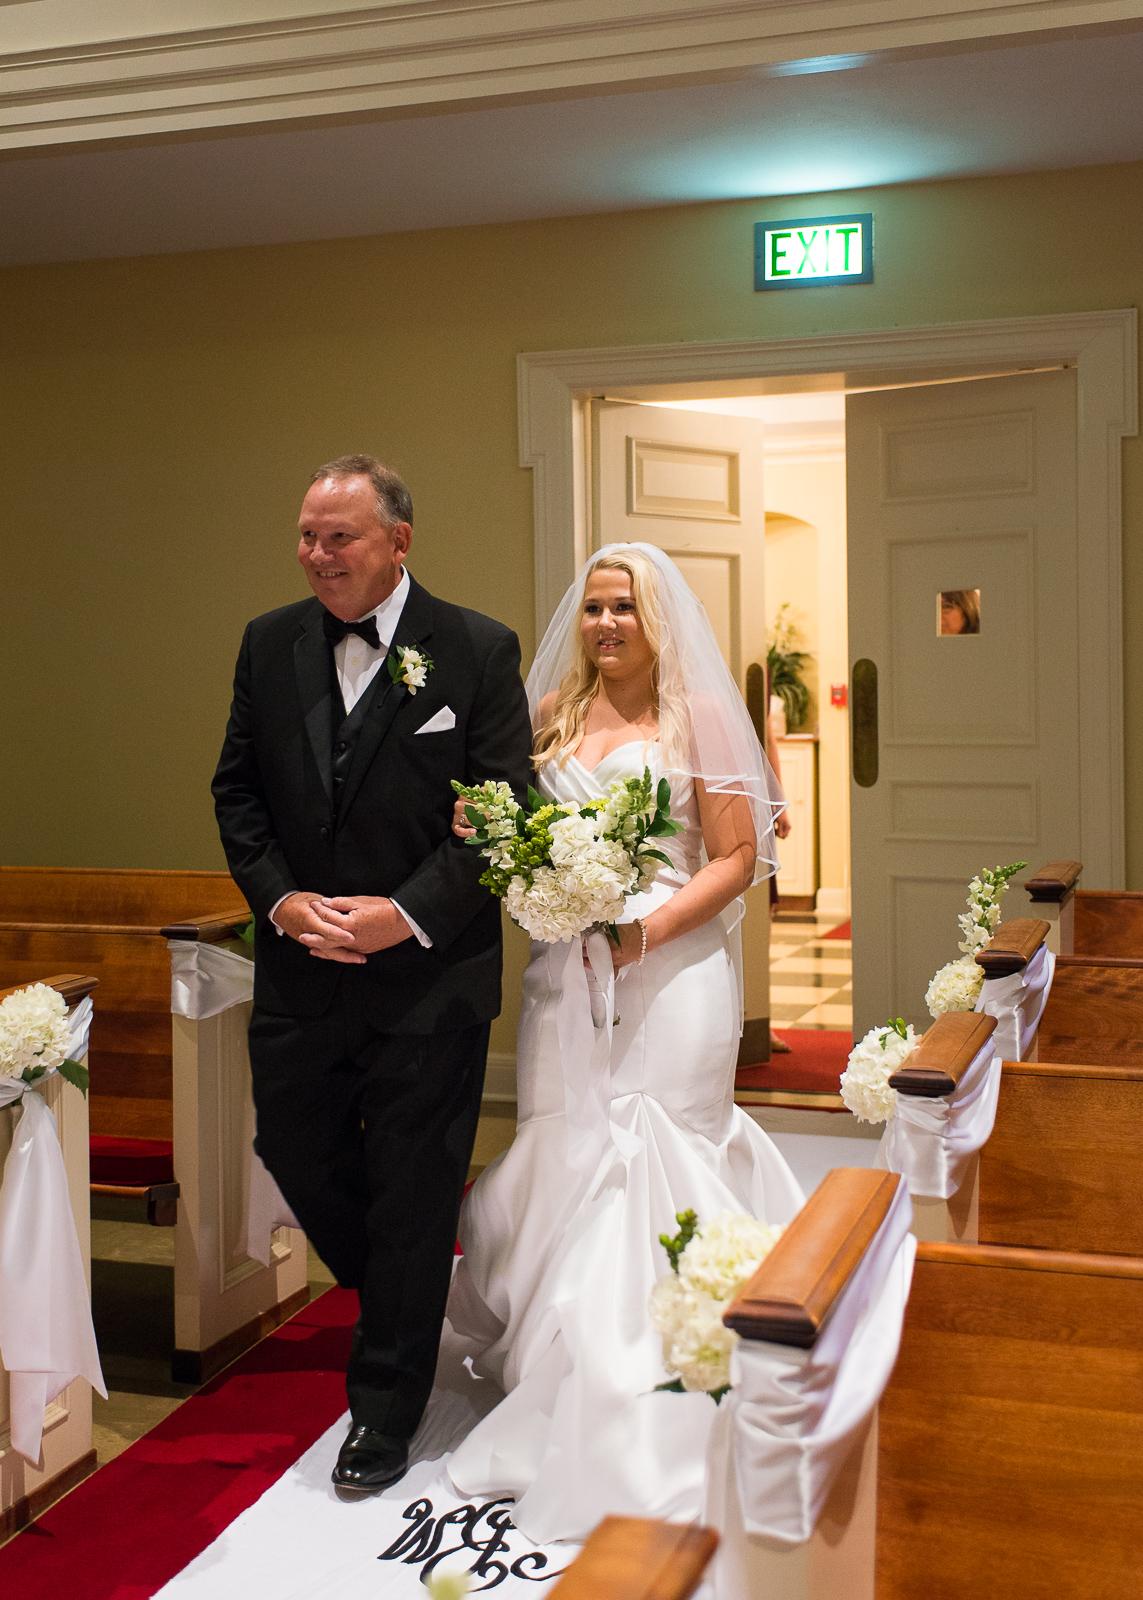 Michael-Napier-Weddings-Cogill-Bizzle-Album-2 (28).jpg